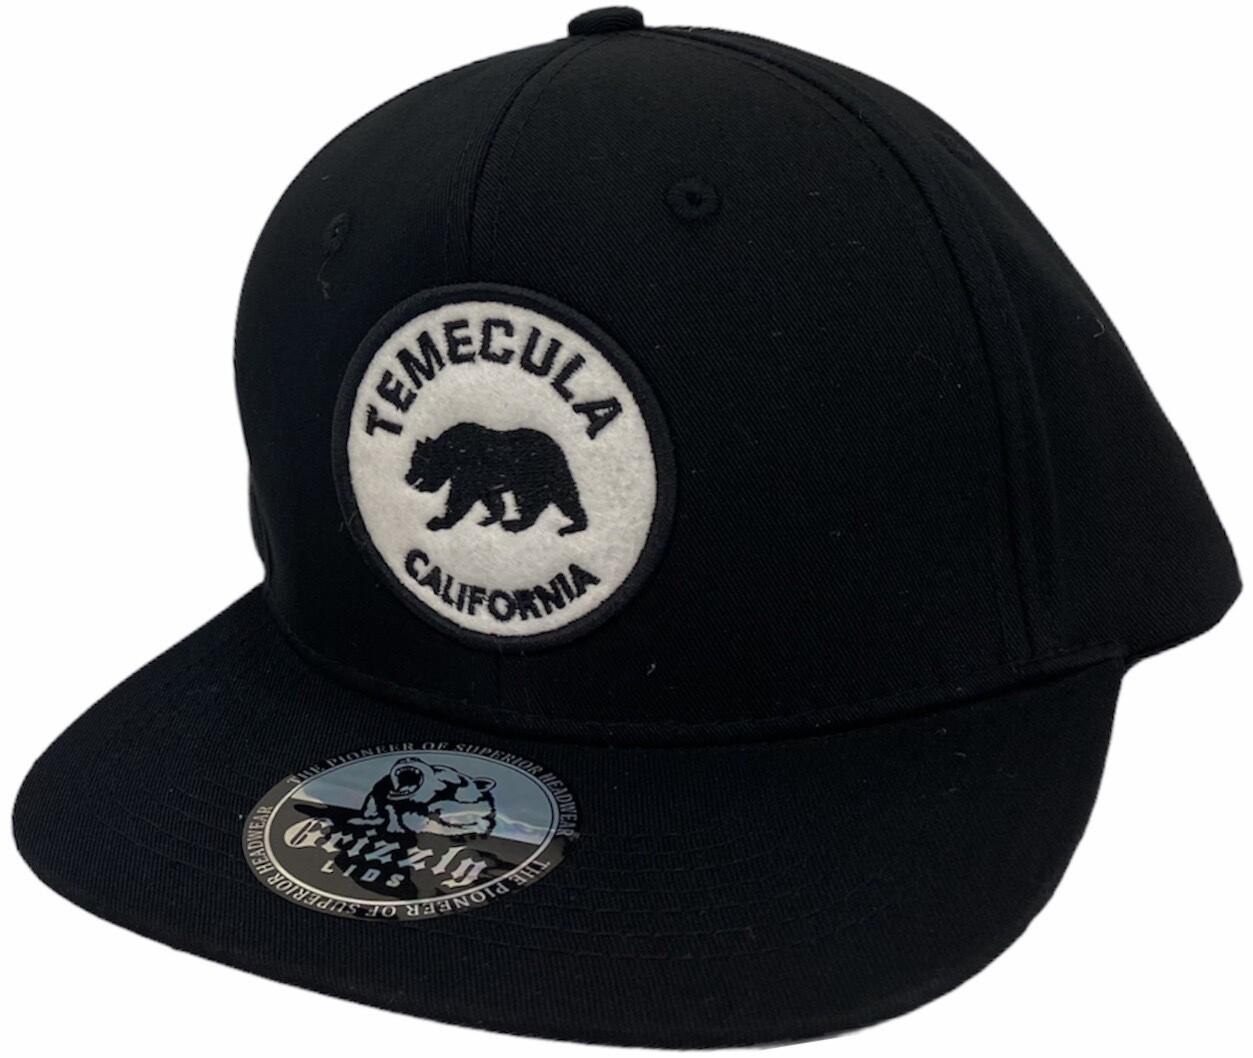 CALIFORNIA STATE CITY ROUND FELT SNAPBACK HAT